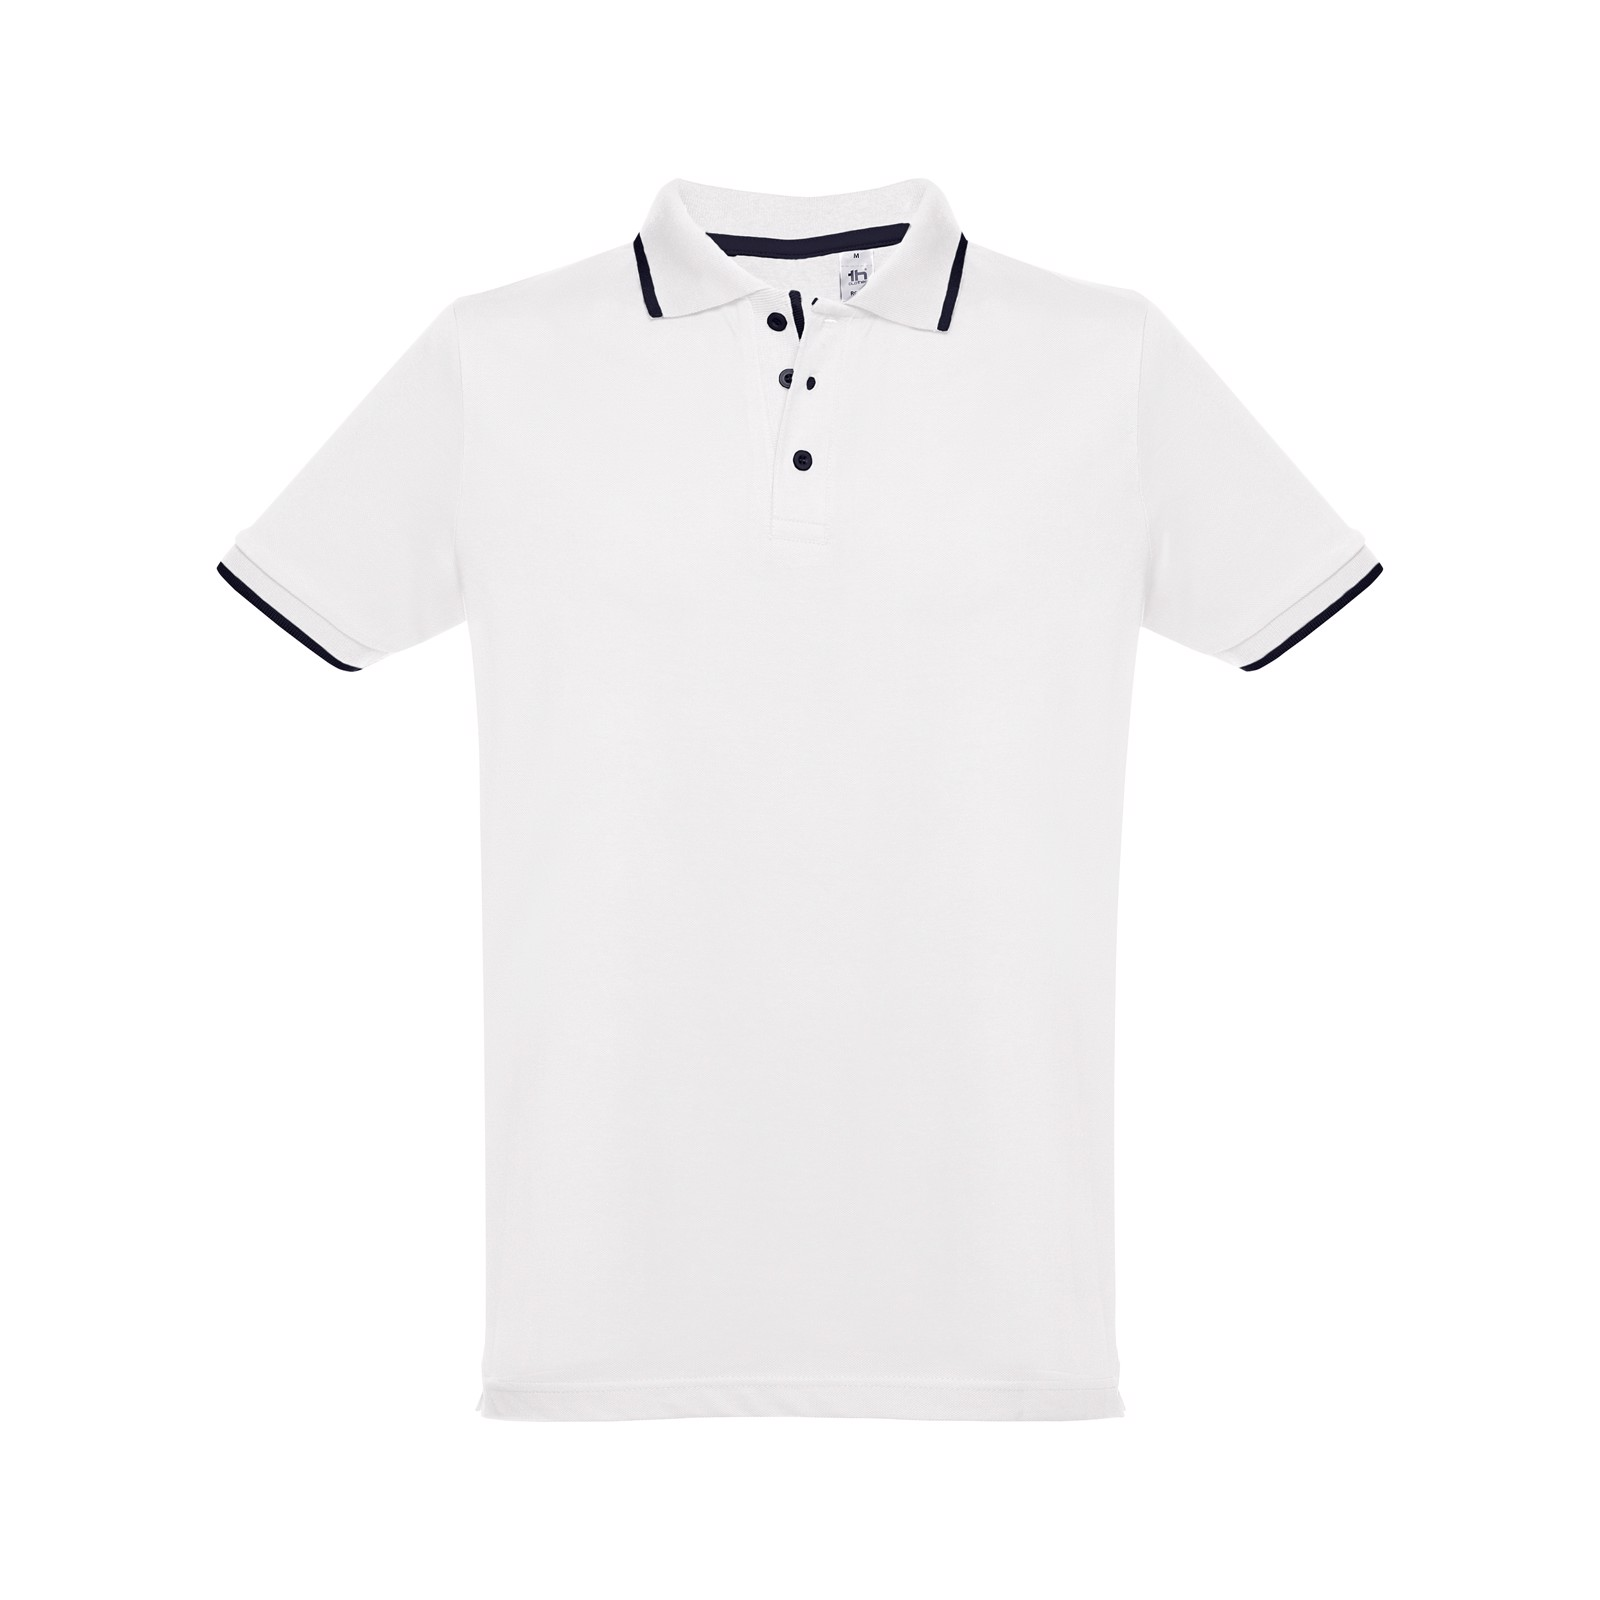 ROME. Ανδρική πόλο μπλούζα slim fit - Λευκό / S